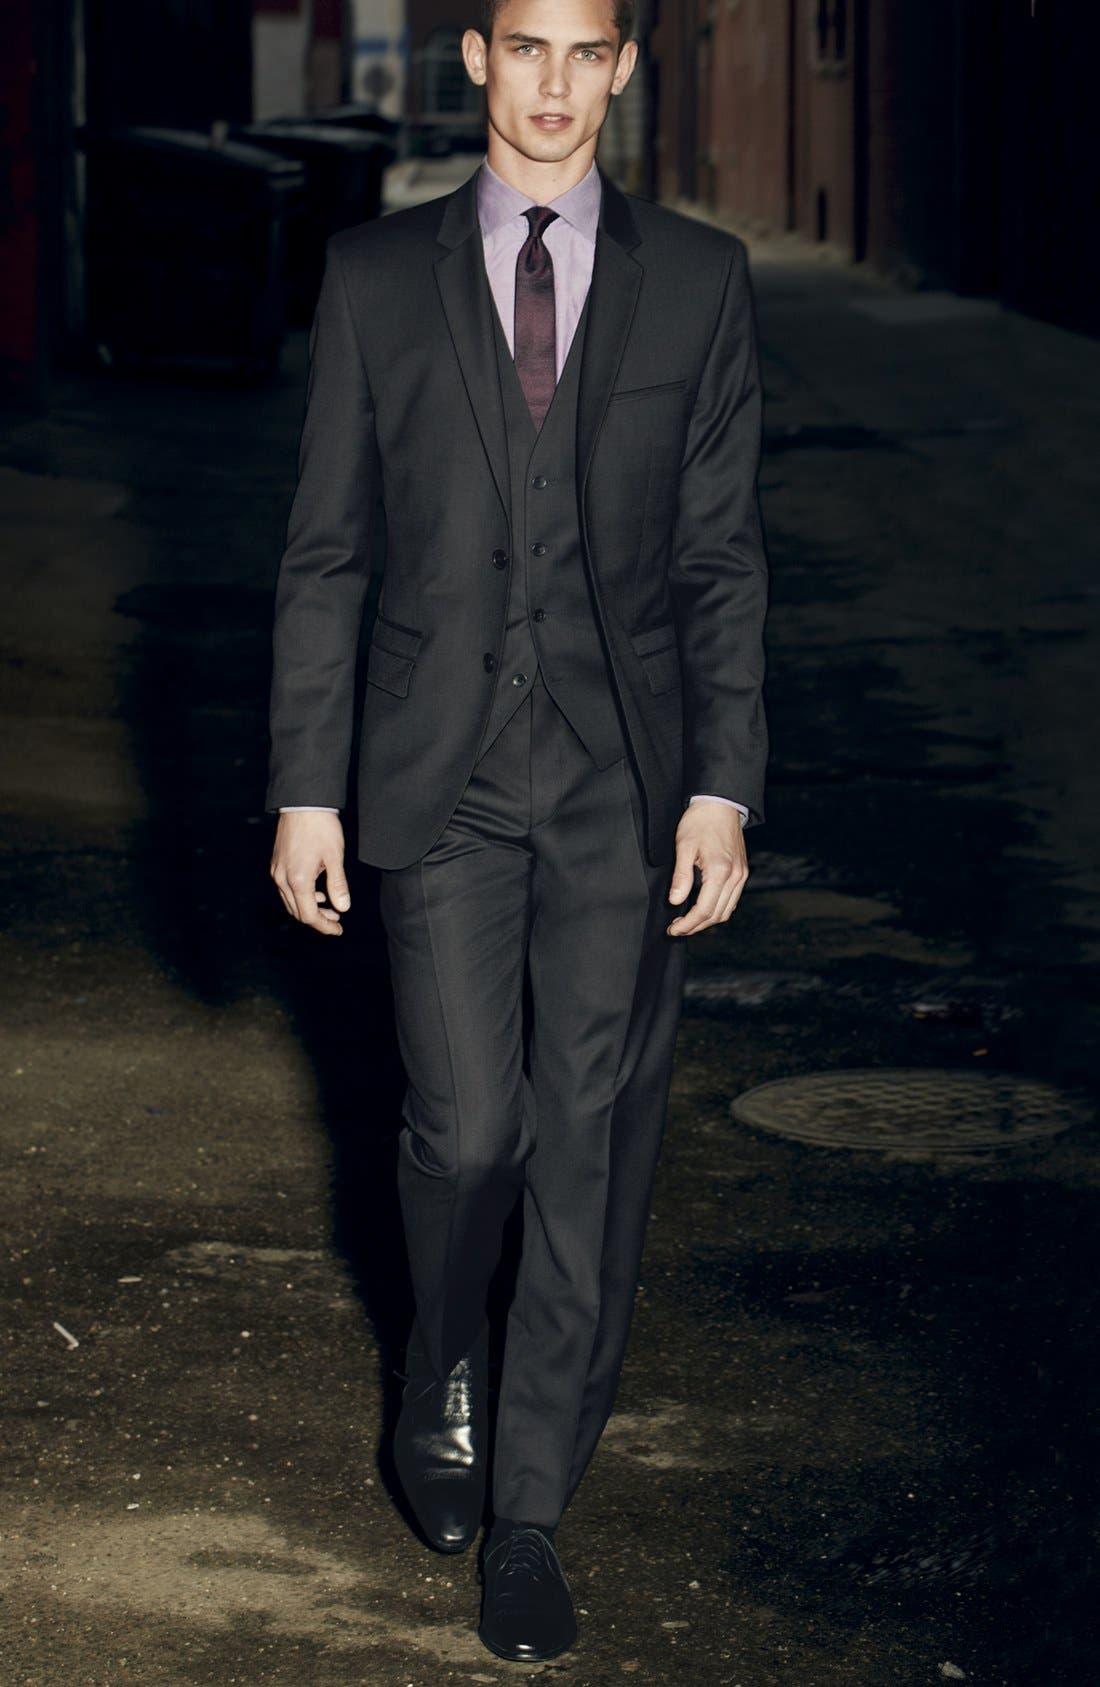 Main Image - HUGO Suit & BOSS HUGO BOSS Dress Shirt